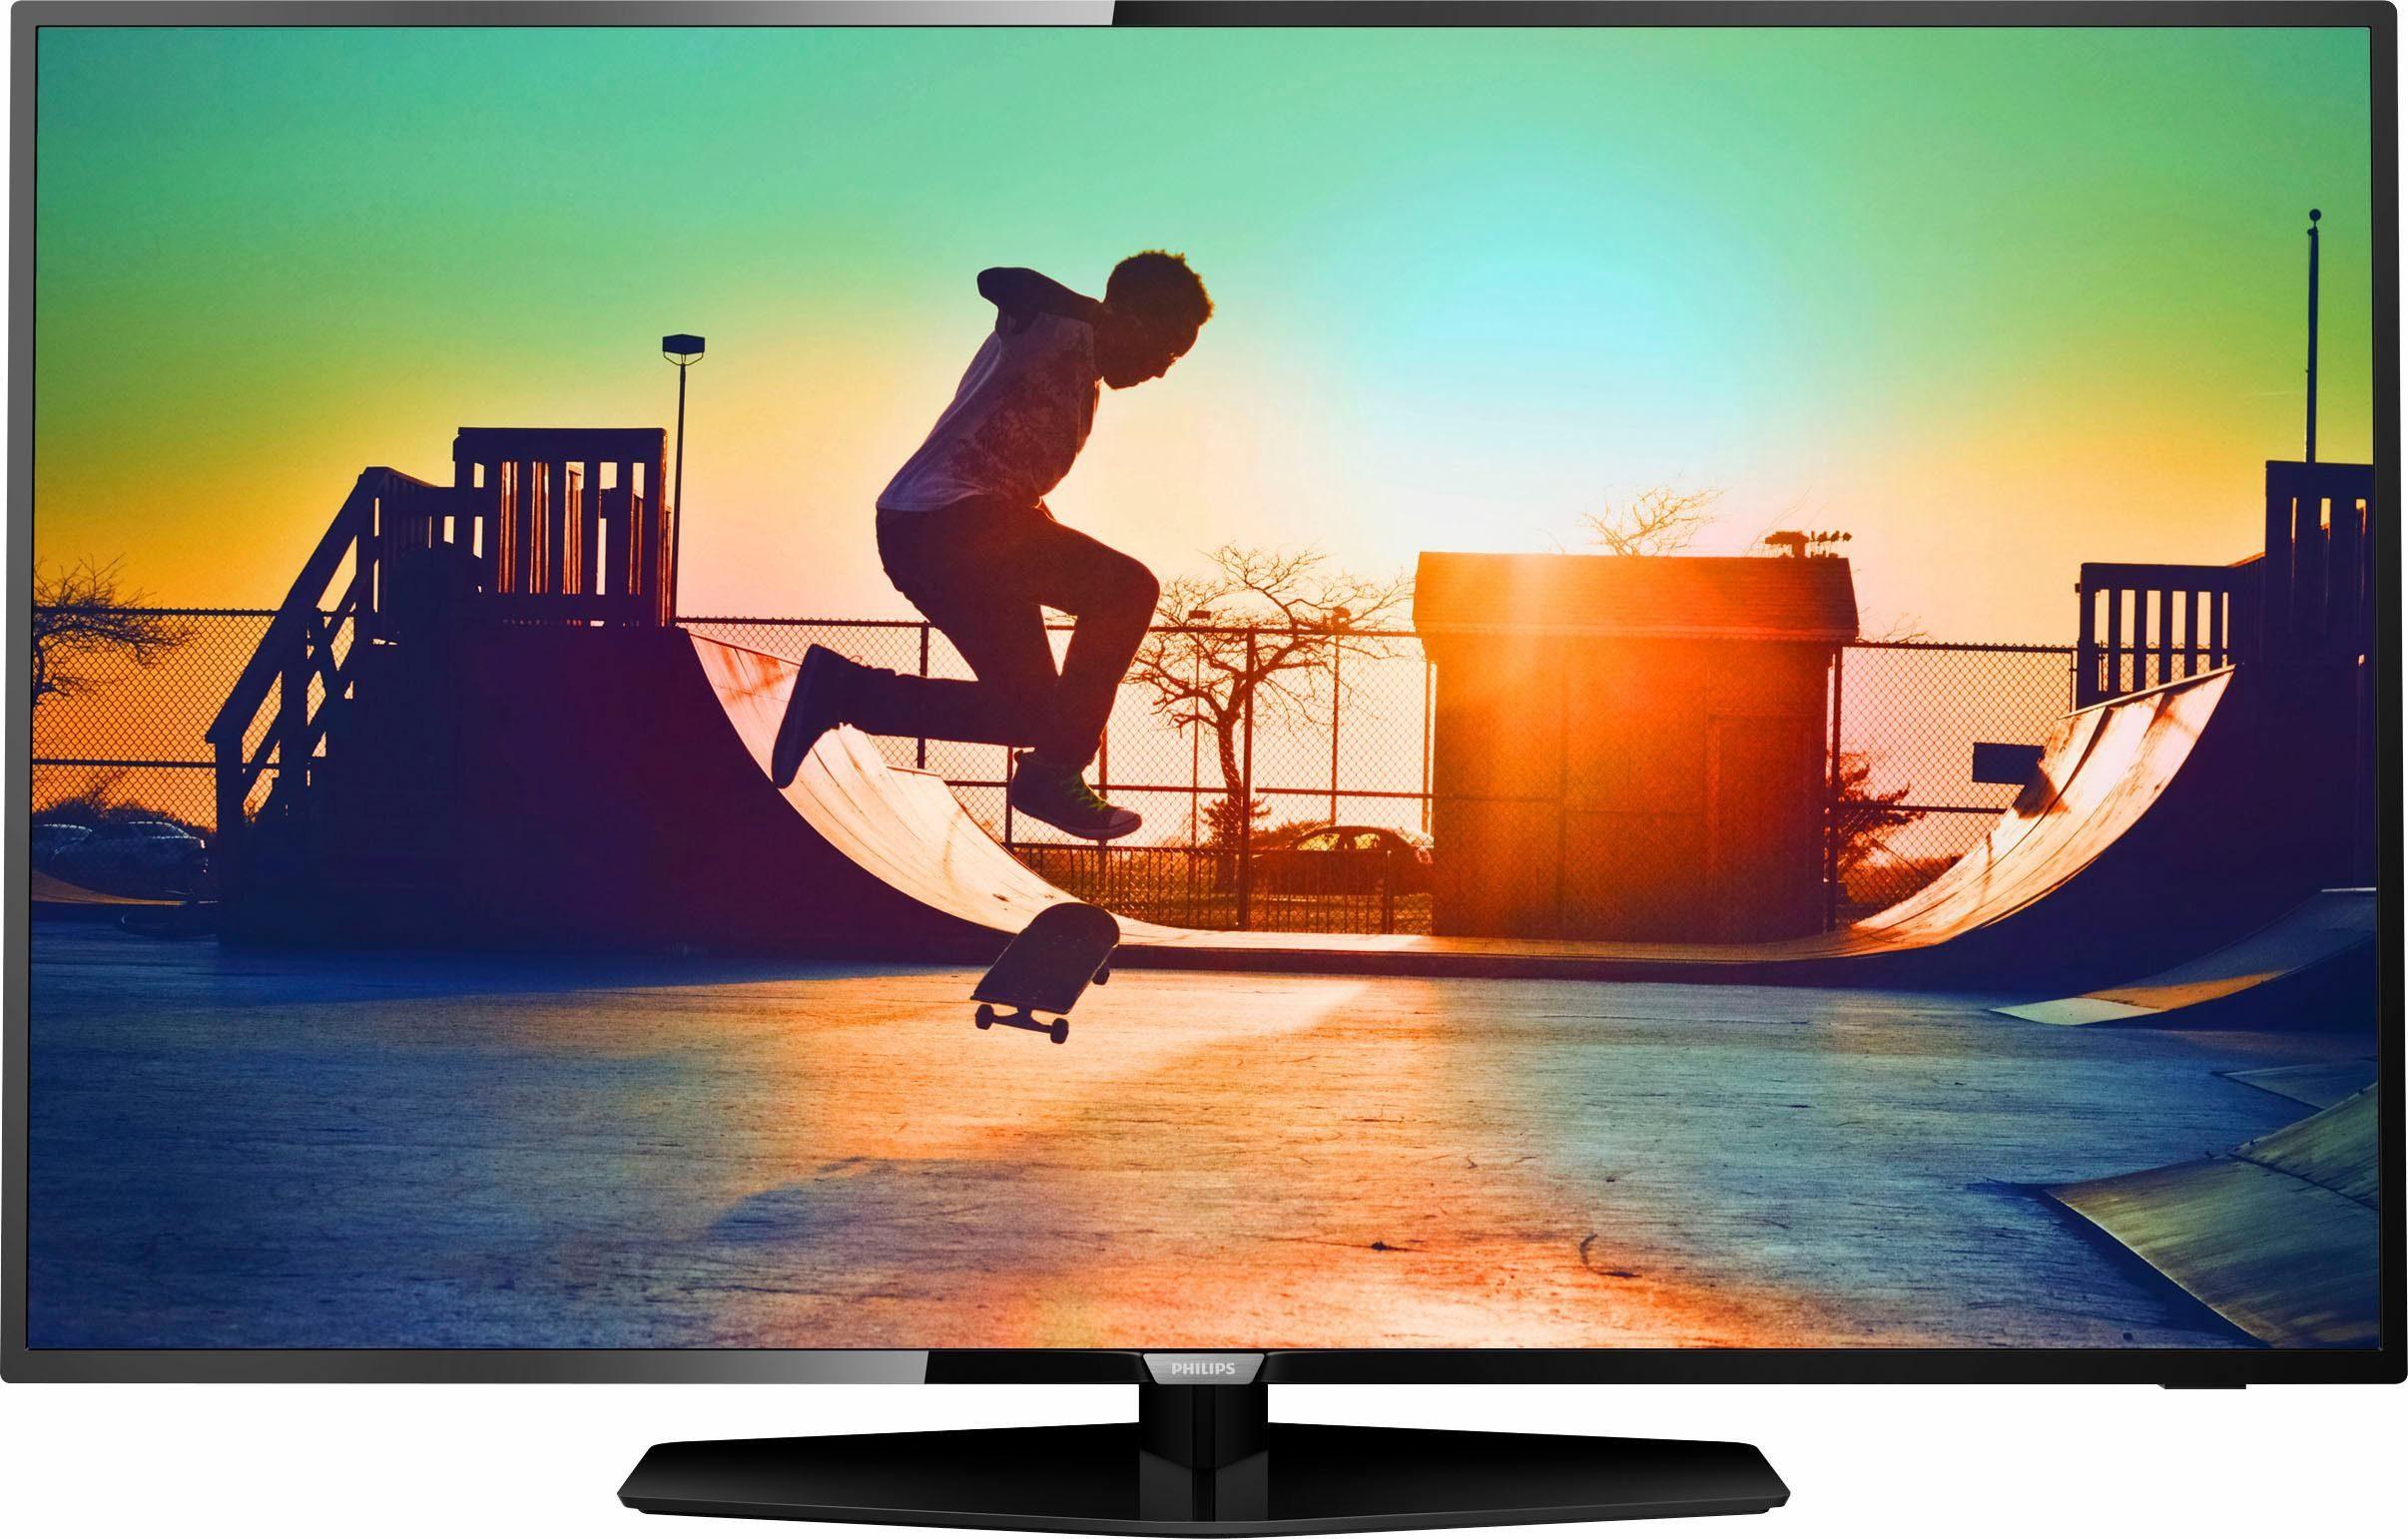 Philips 55PUS6162 LED-Fernseher (55 Zoll, 4K Ultra HD, Smart-TV, 36 Monate Garantie)